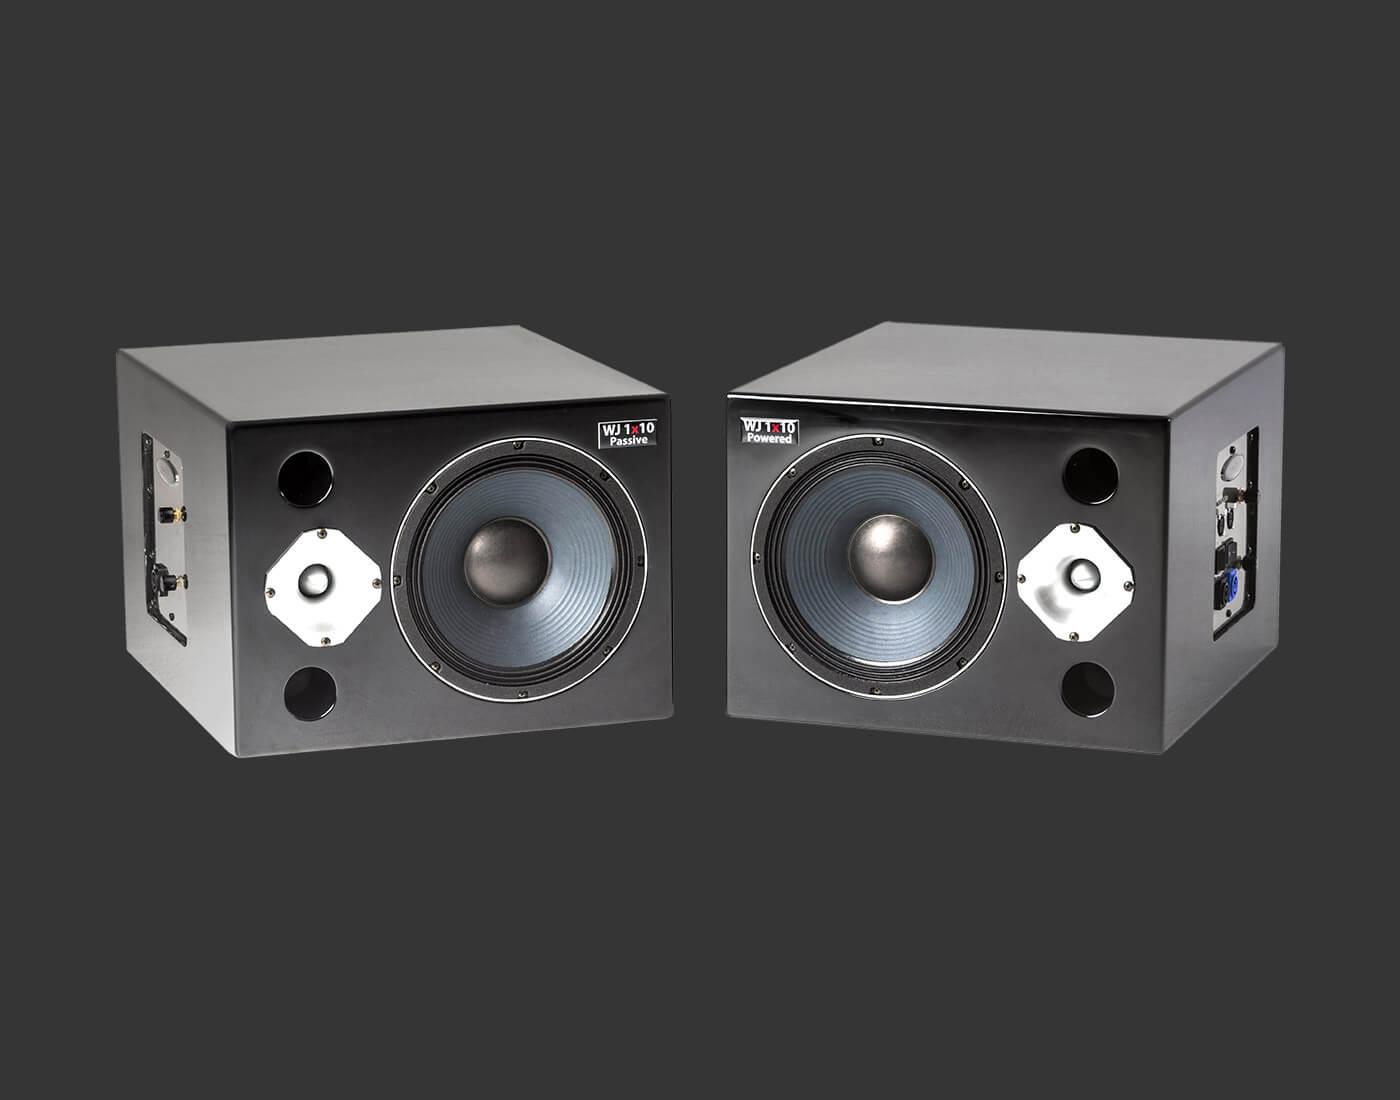 Wayne Jones Audio - Hi Fi Studio Monitors